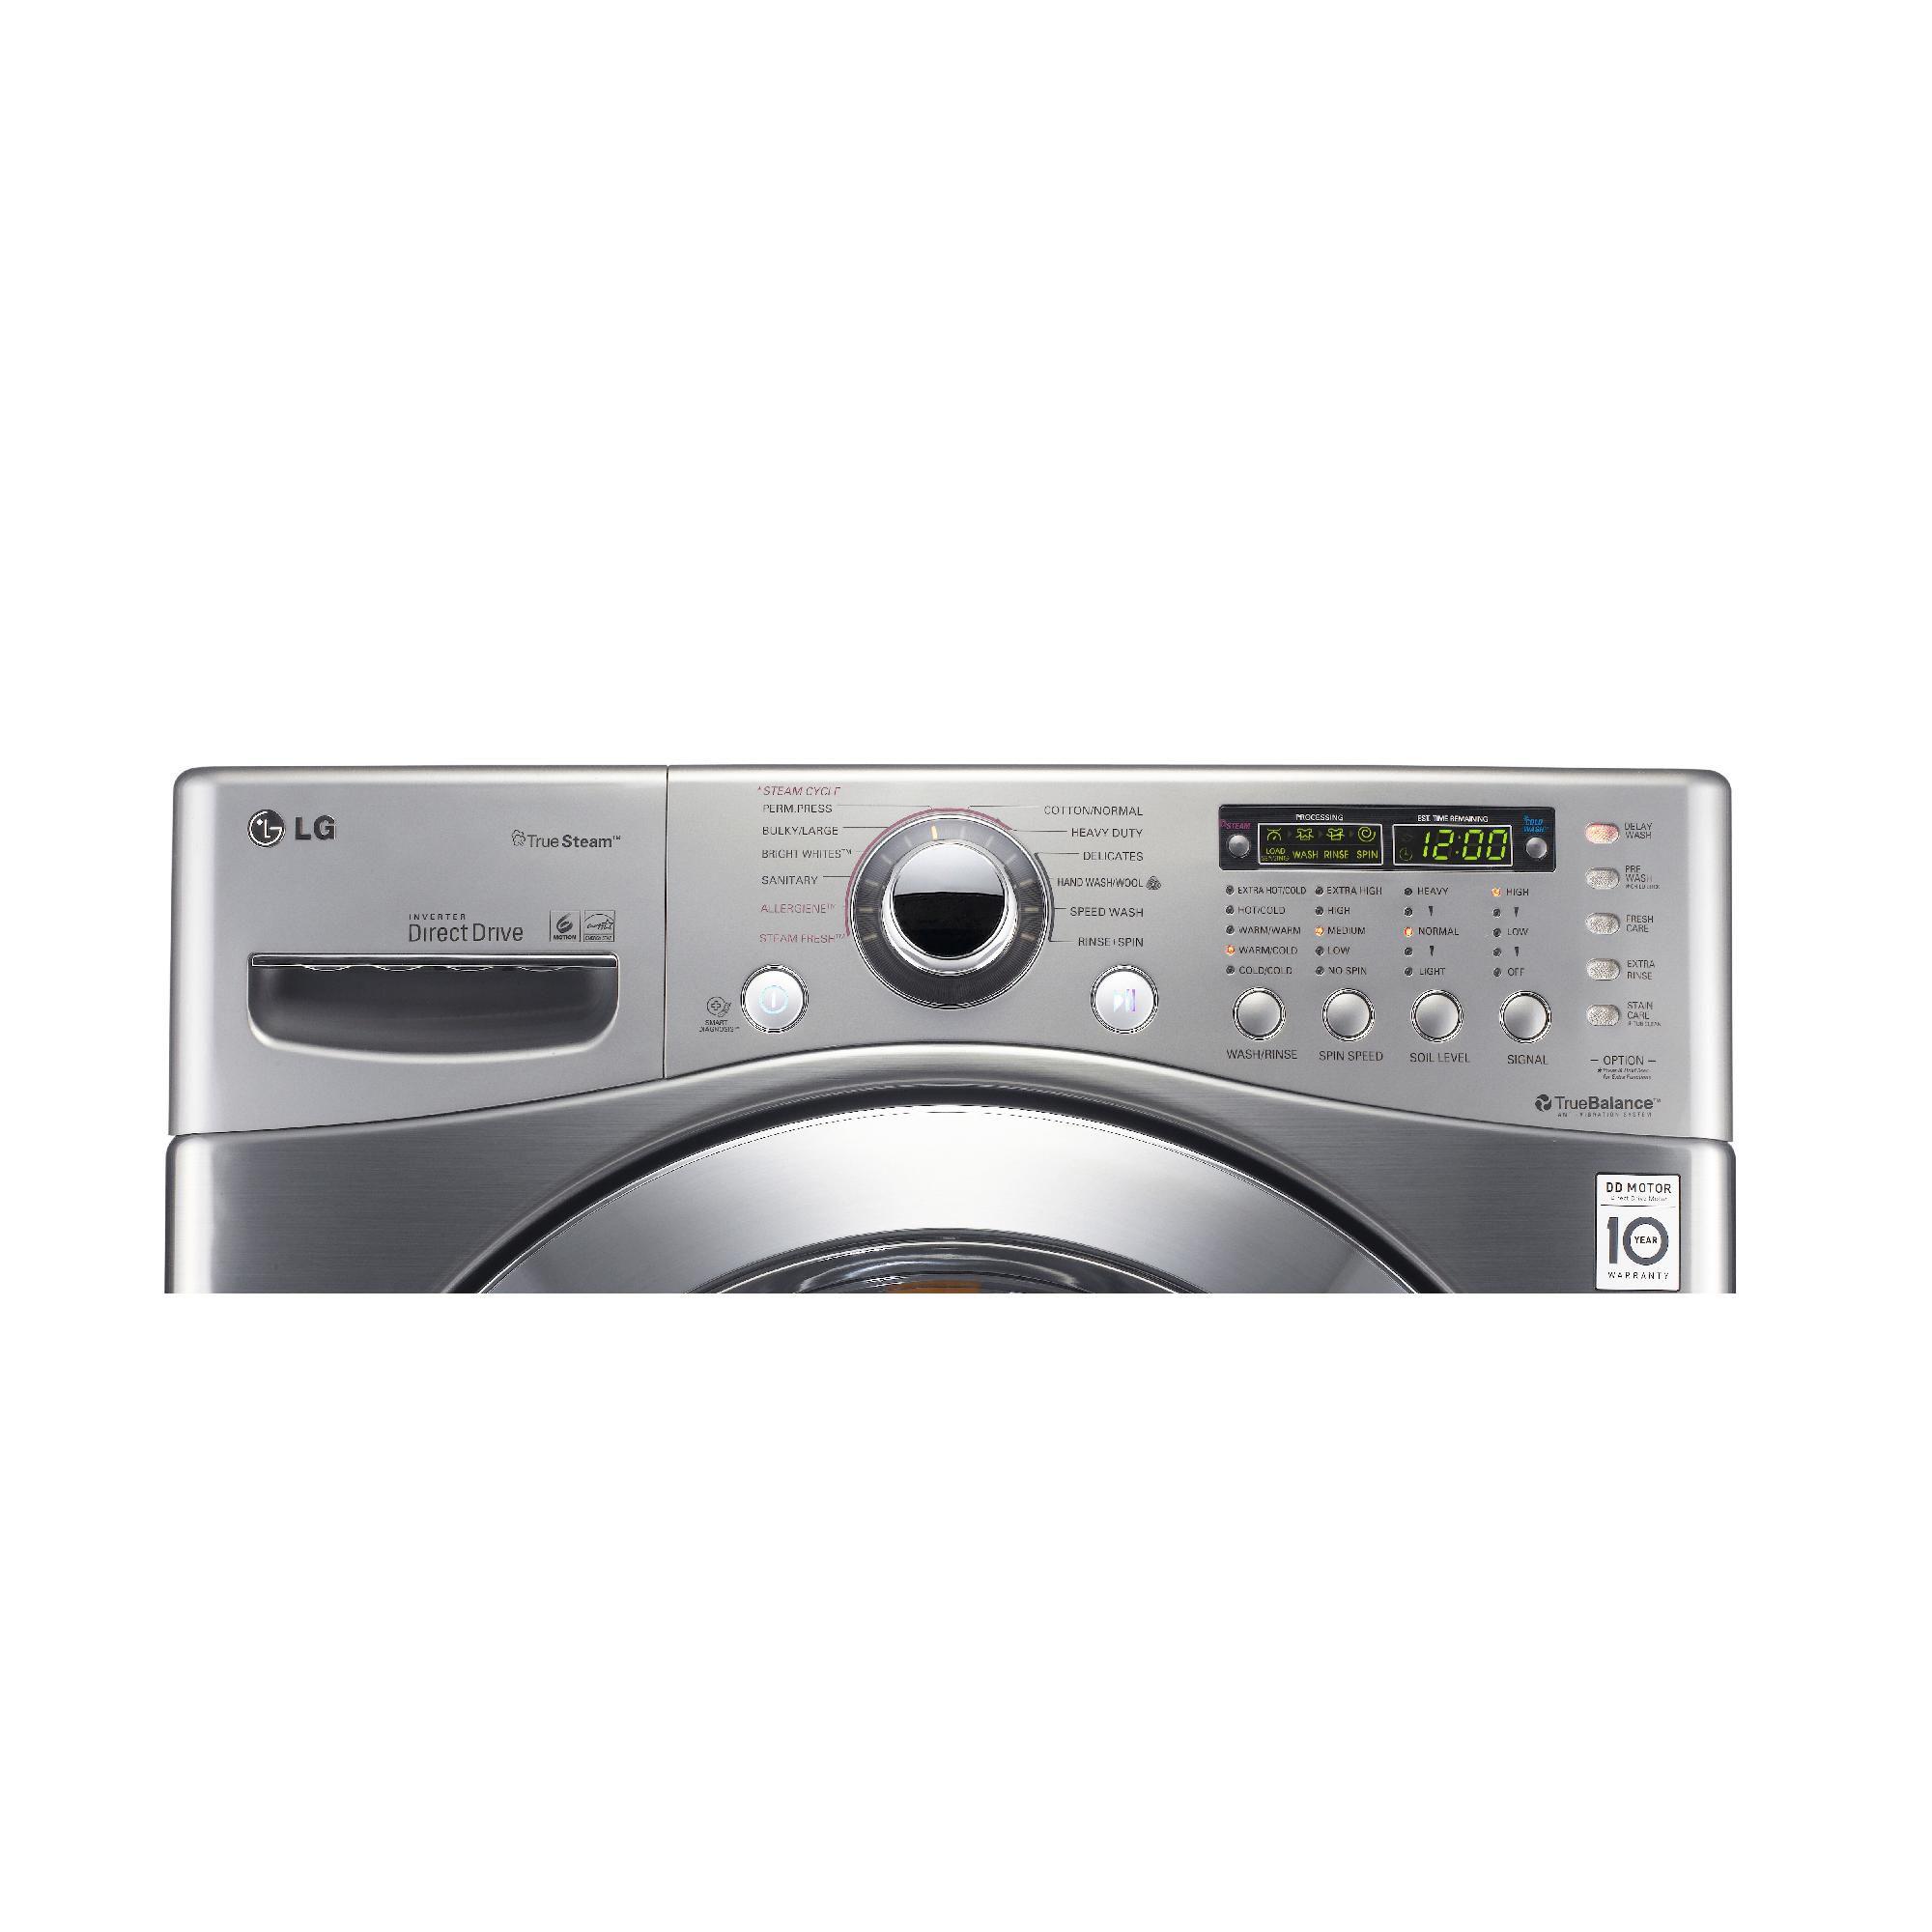 LG 3.9 cu. ft. Front-Load Washer, Metallic (Model WM3360HVCA)